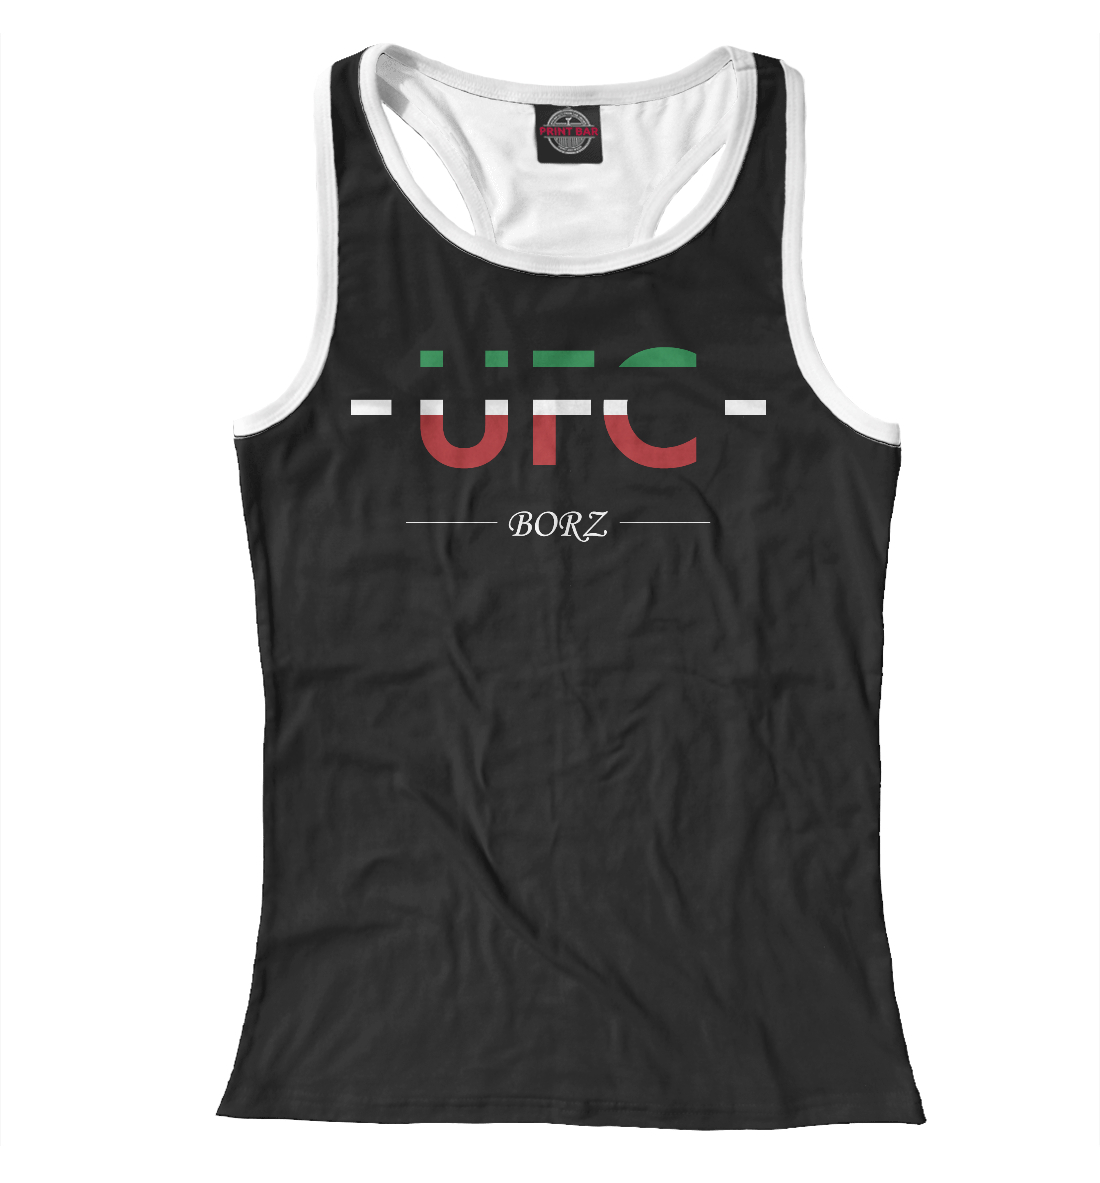 Купить UFC Borz, Printbar, Майки борцовки, MNU-162394-mayb-1